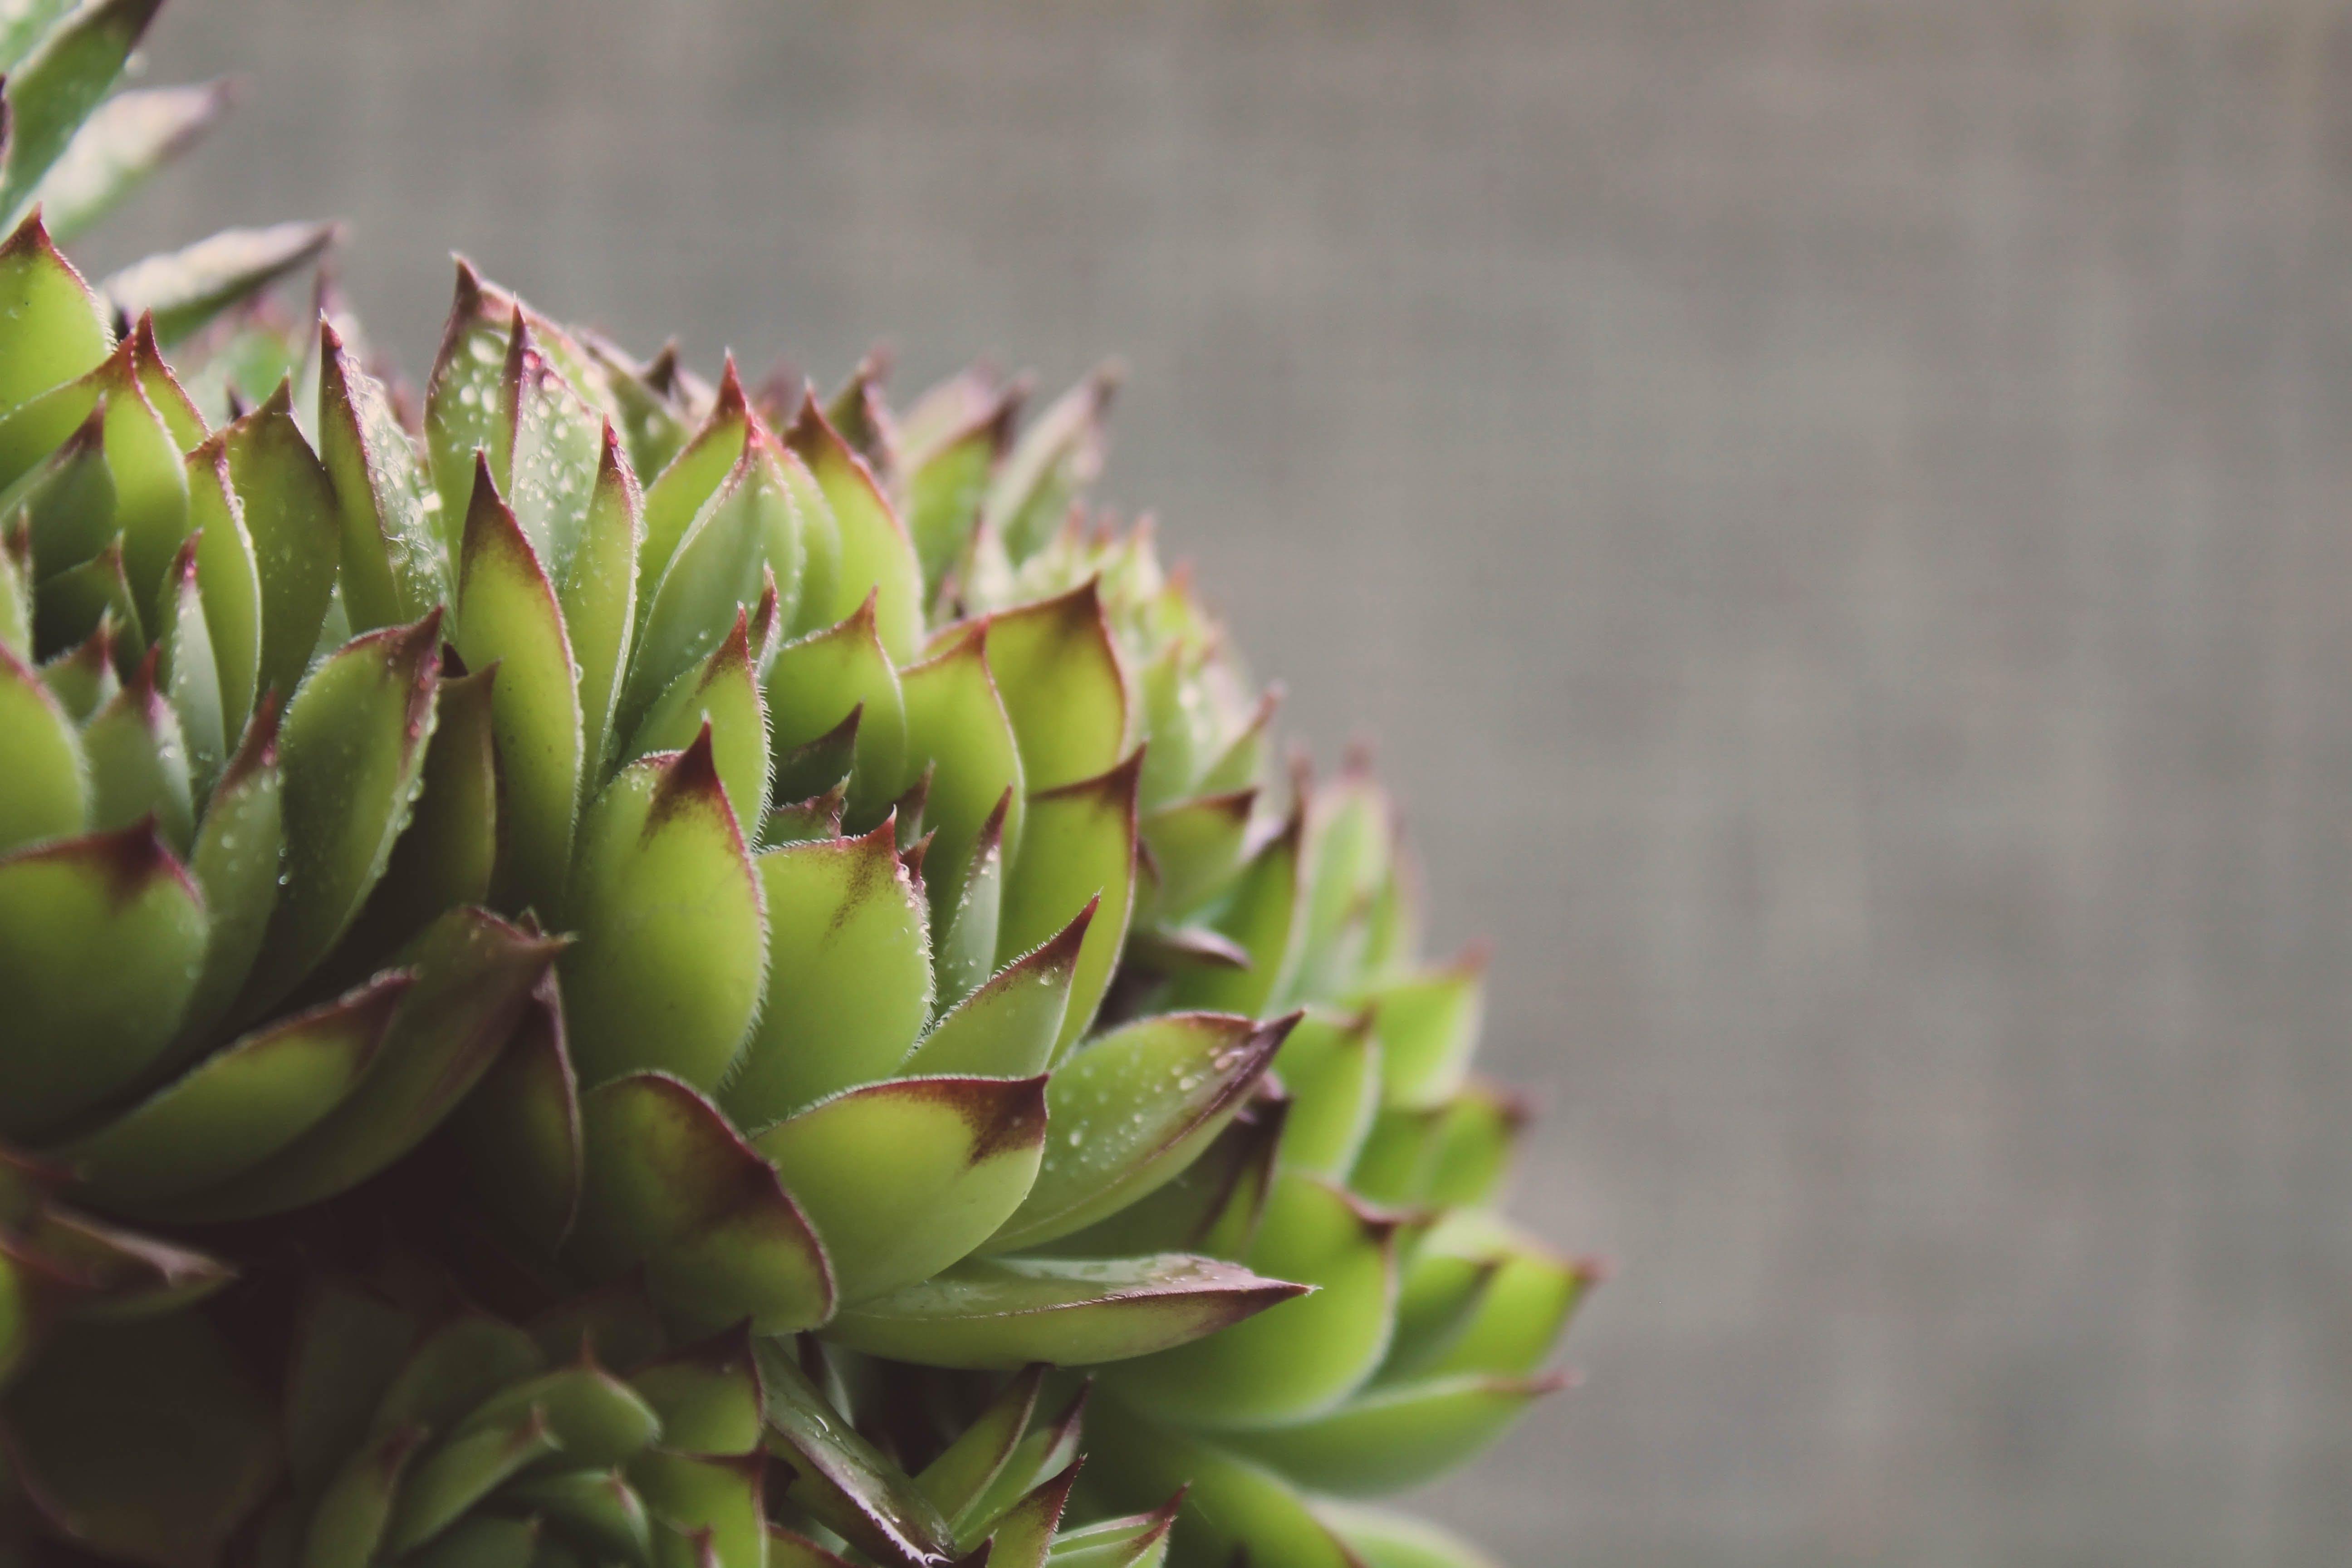 Kostenloses Stock Foto zu dunkelgrüne pflanzen, garten, gartenarbeit, gartenpflanze